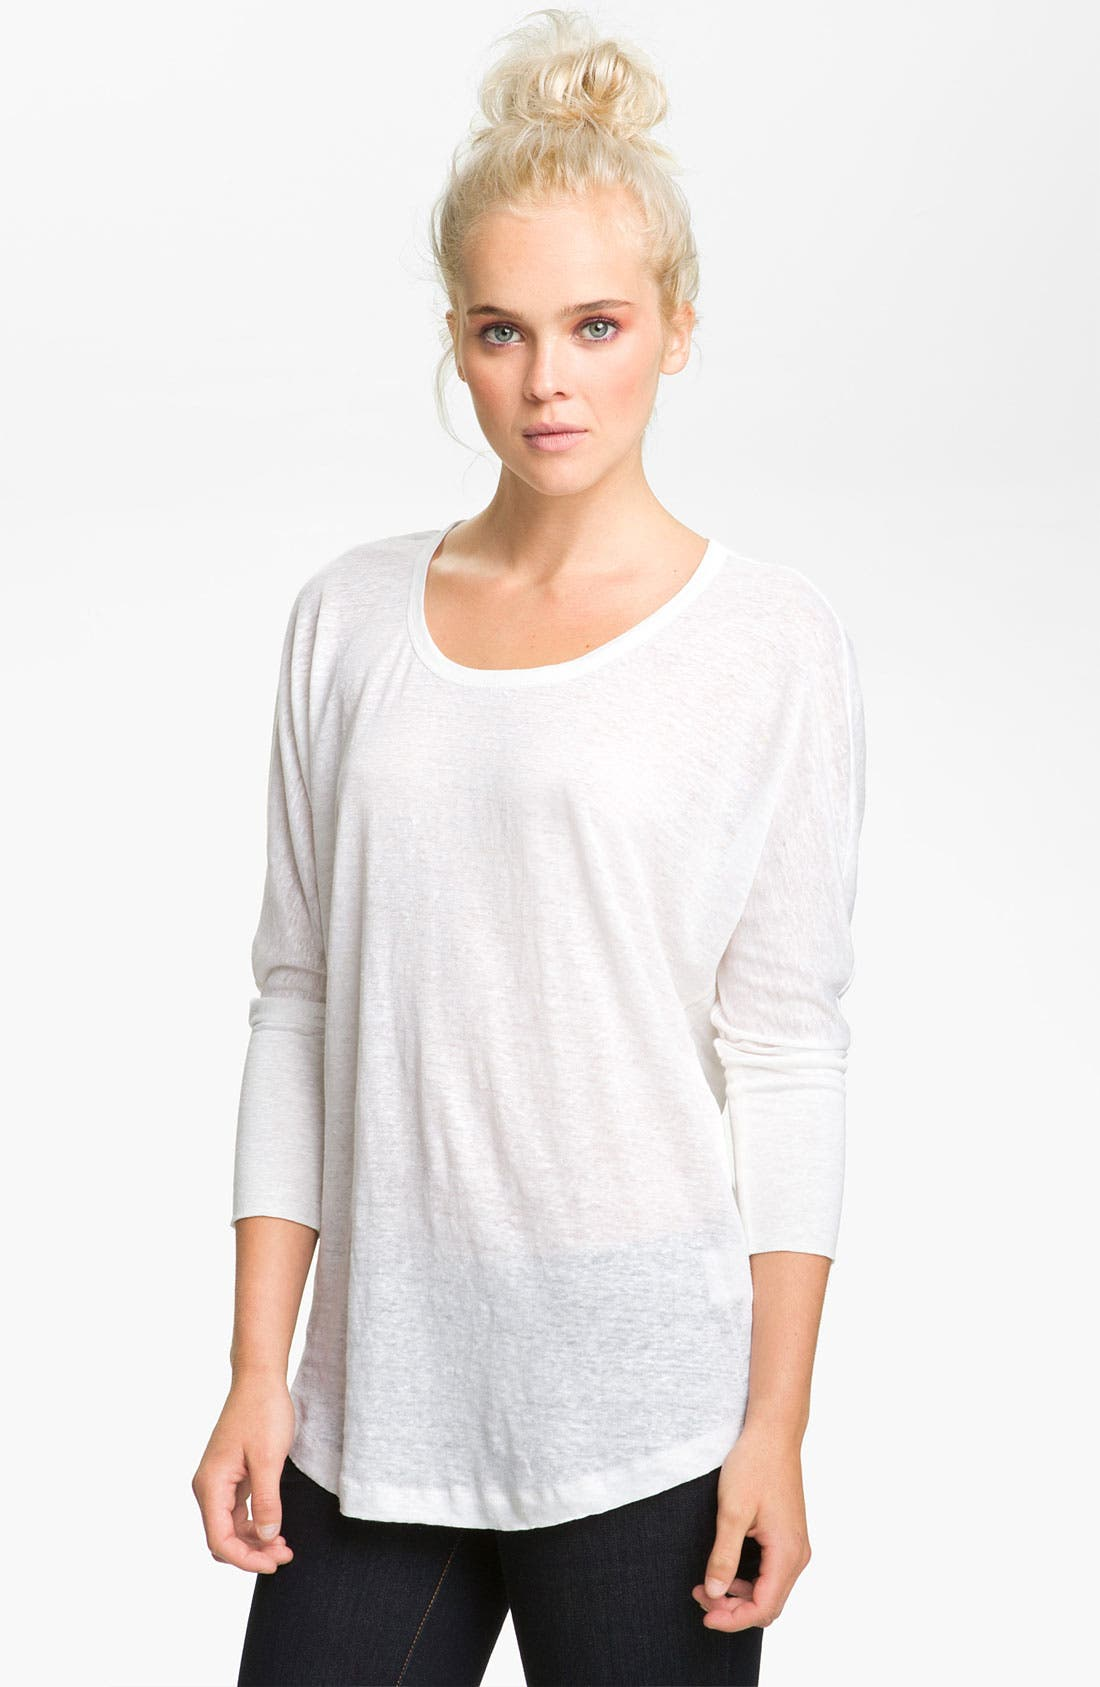 Alternate Image 1 Selected - Joie 'Ashlee' Linen Top